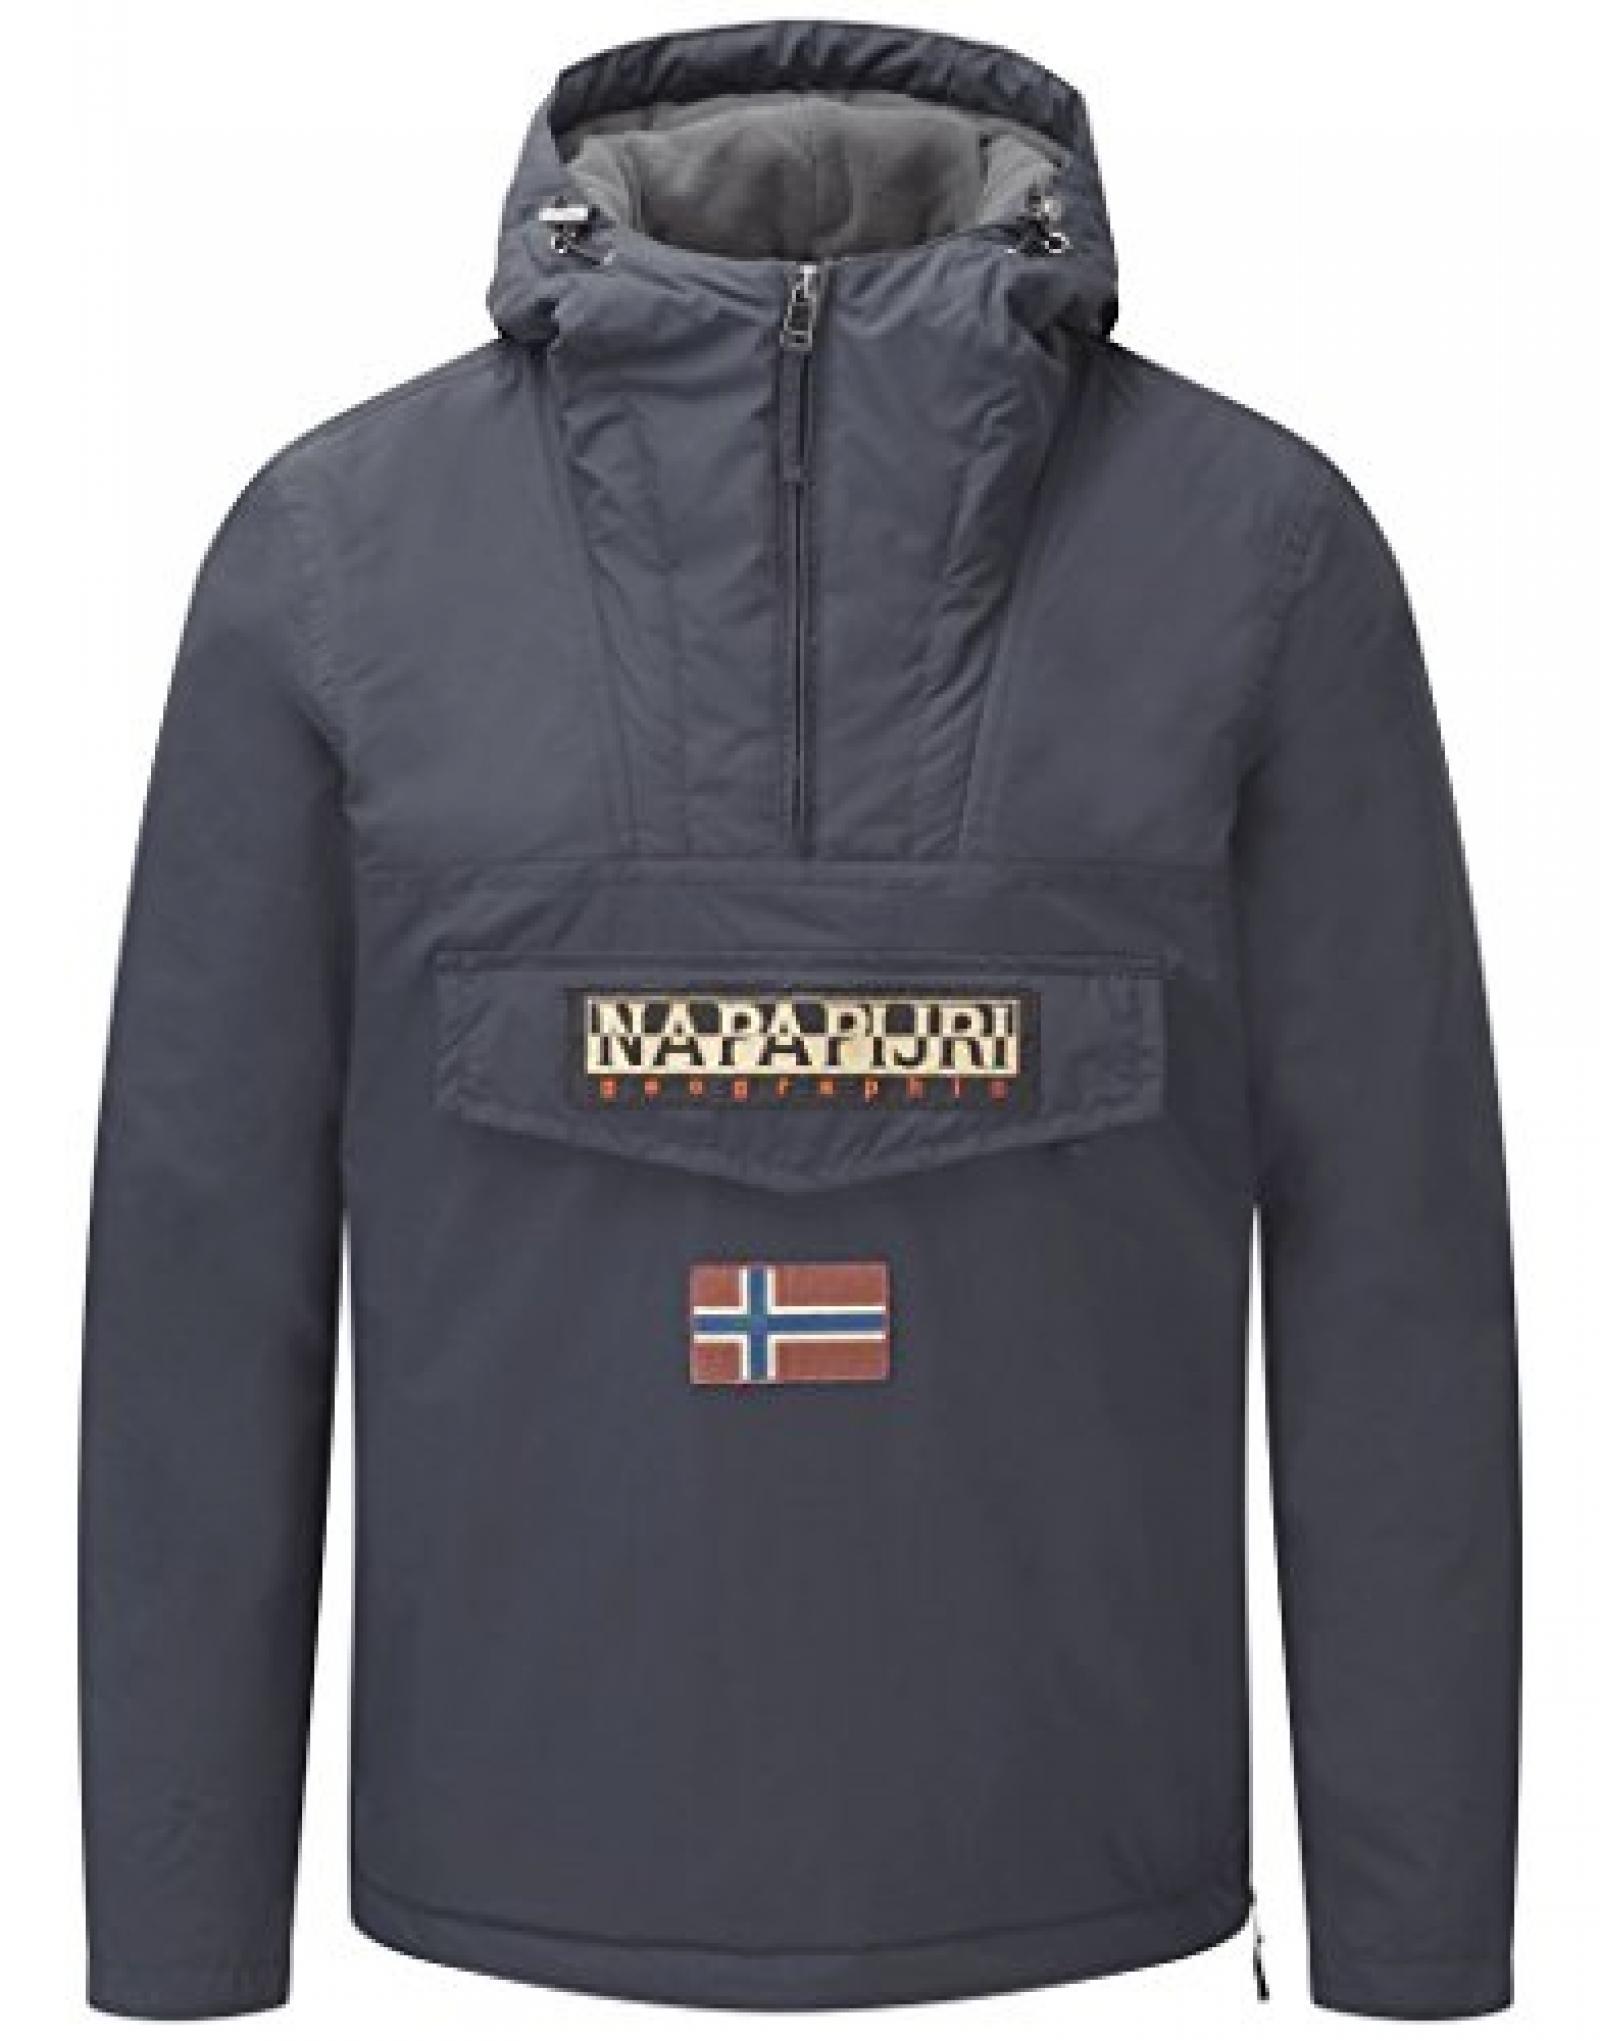 Napapijri Men?s Rainforest Winter Jacket ? Blu Marine N0Y5XE176